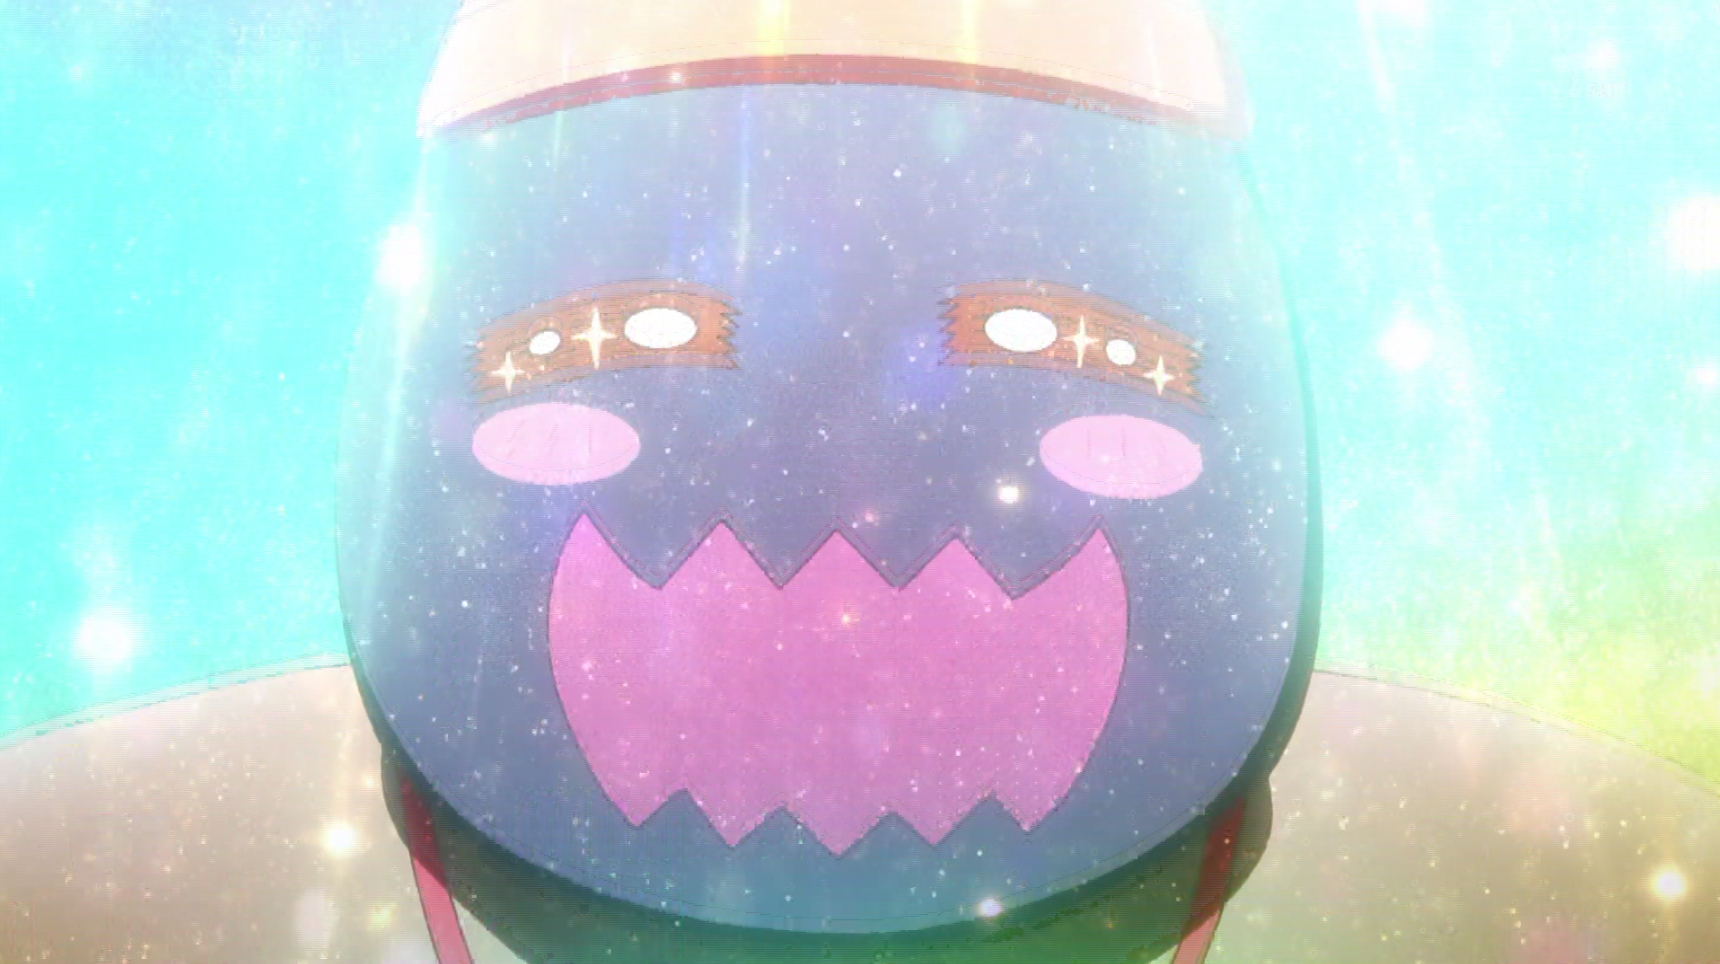 HUGっとプリキュア第34話感想ネタバレ1 (264)